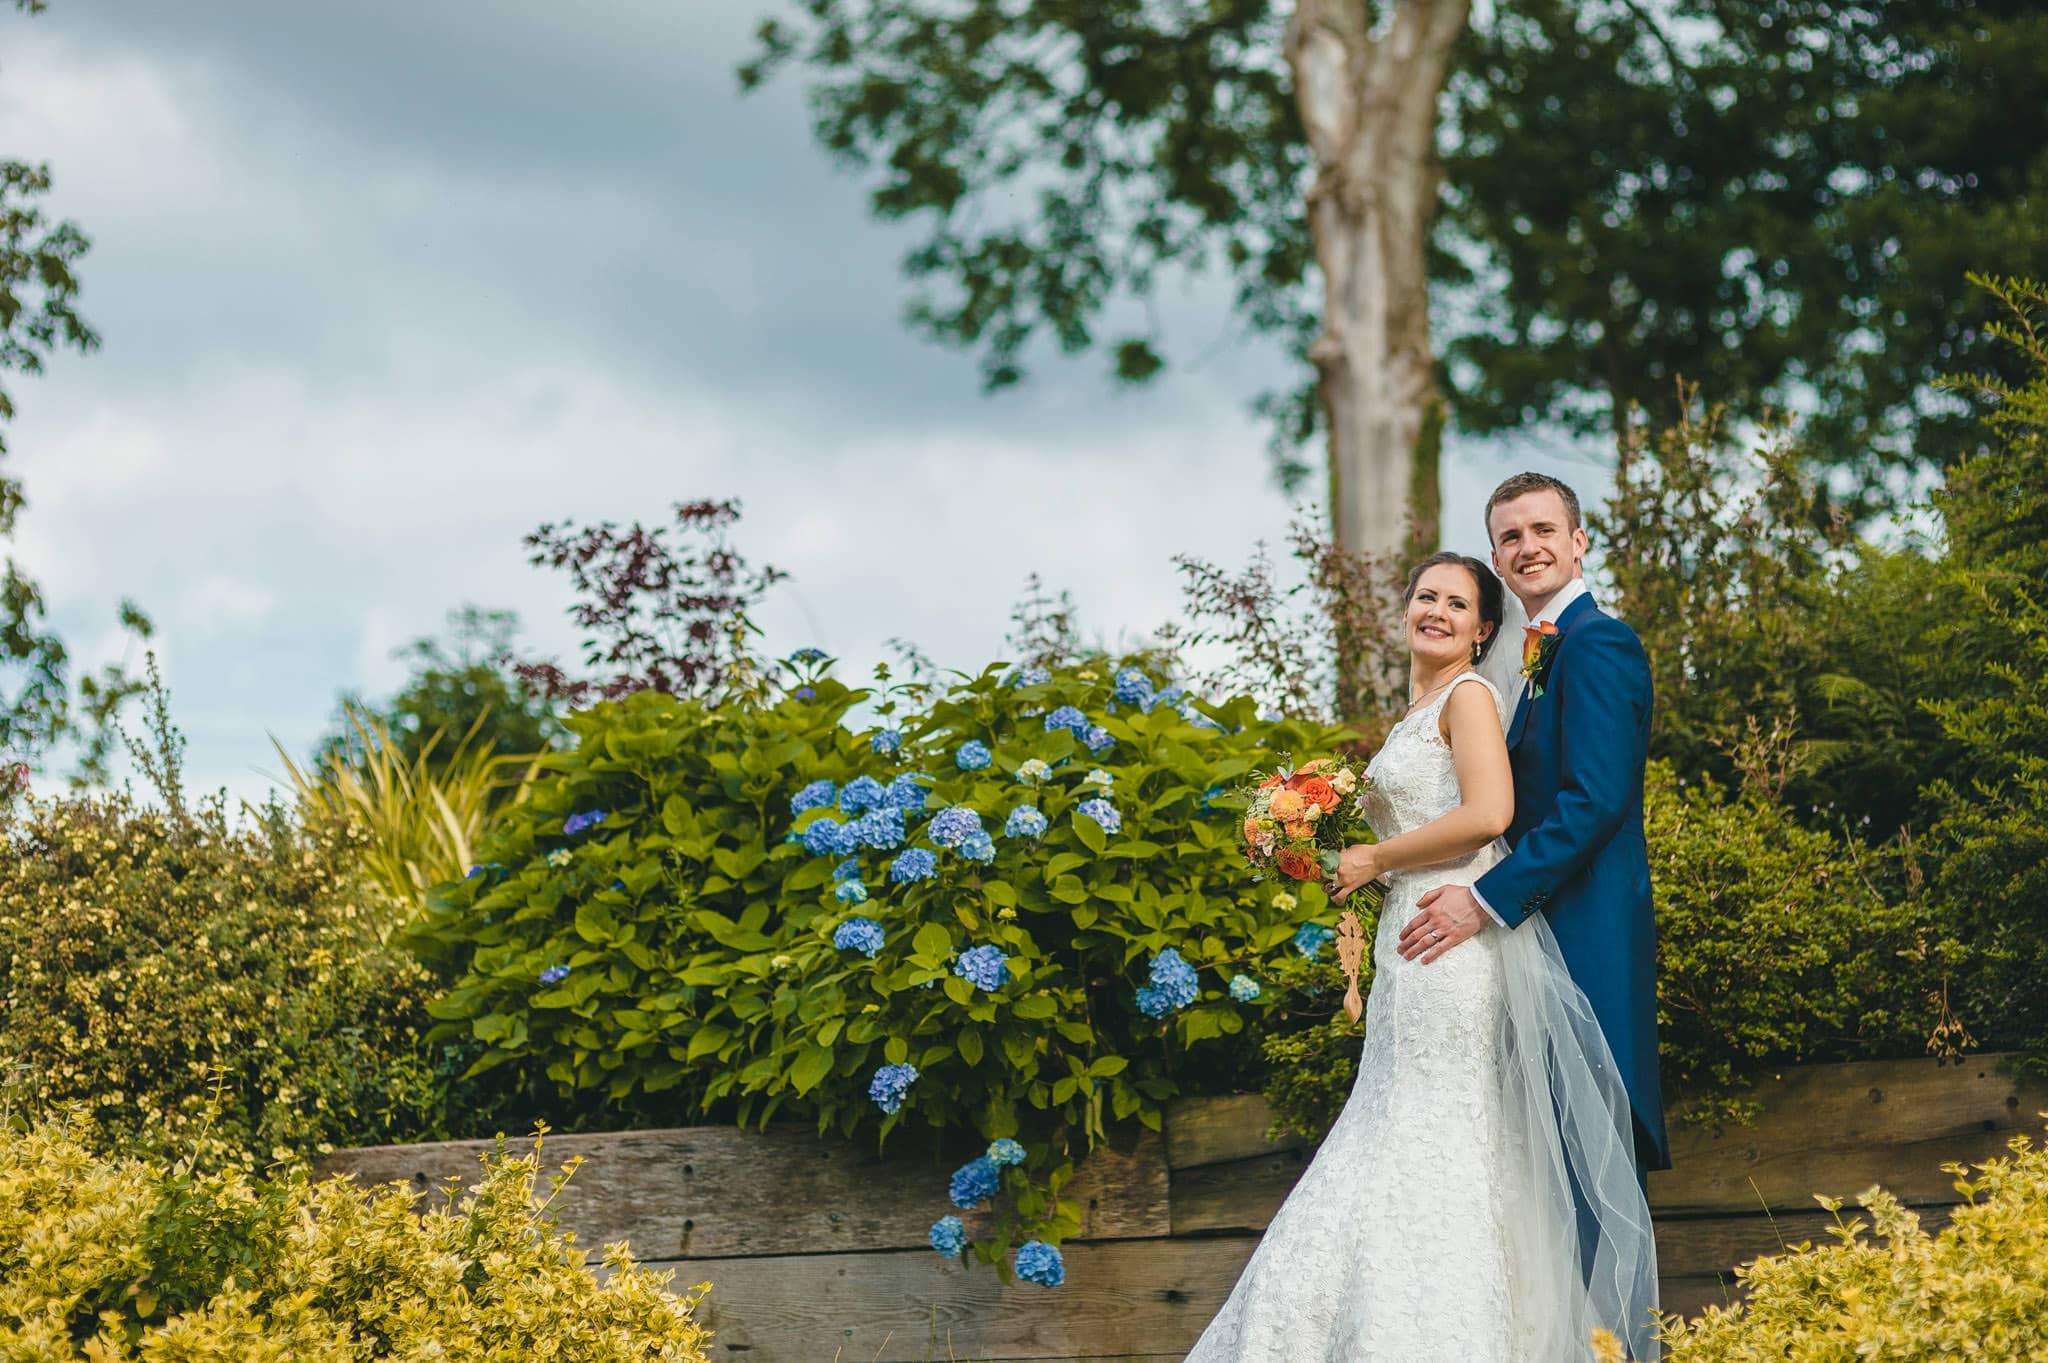 Wedding photography at Y Talbot Hotel in Tregaron, Wales   Tina + Phil 51